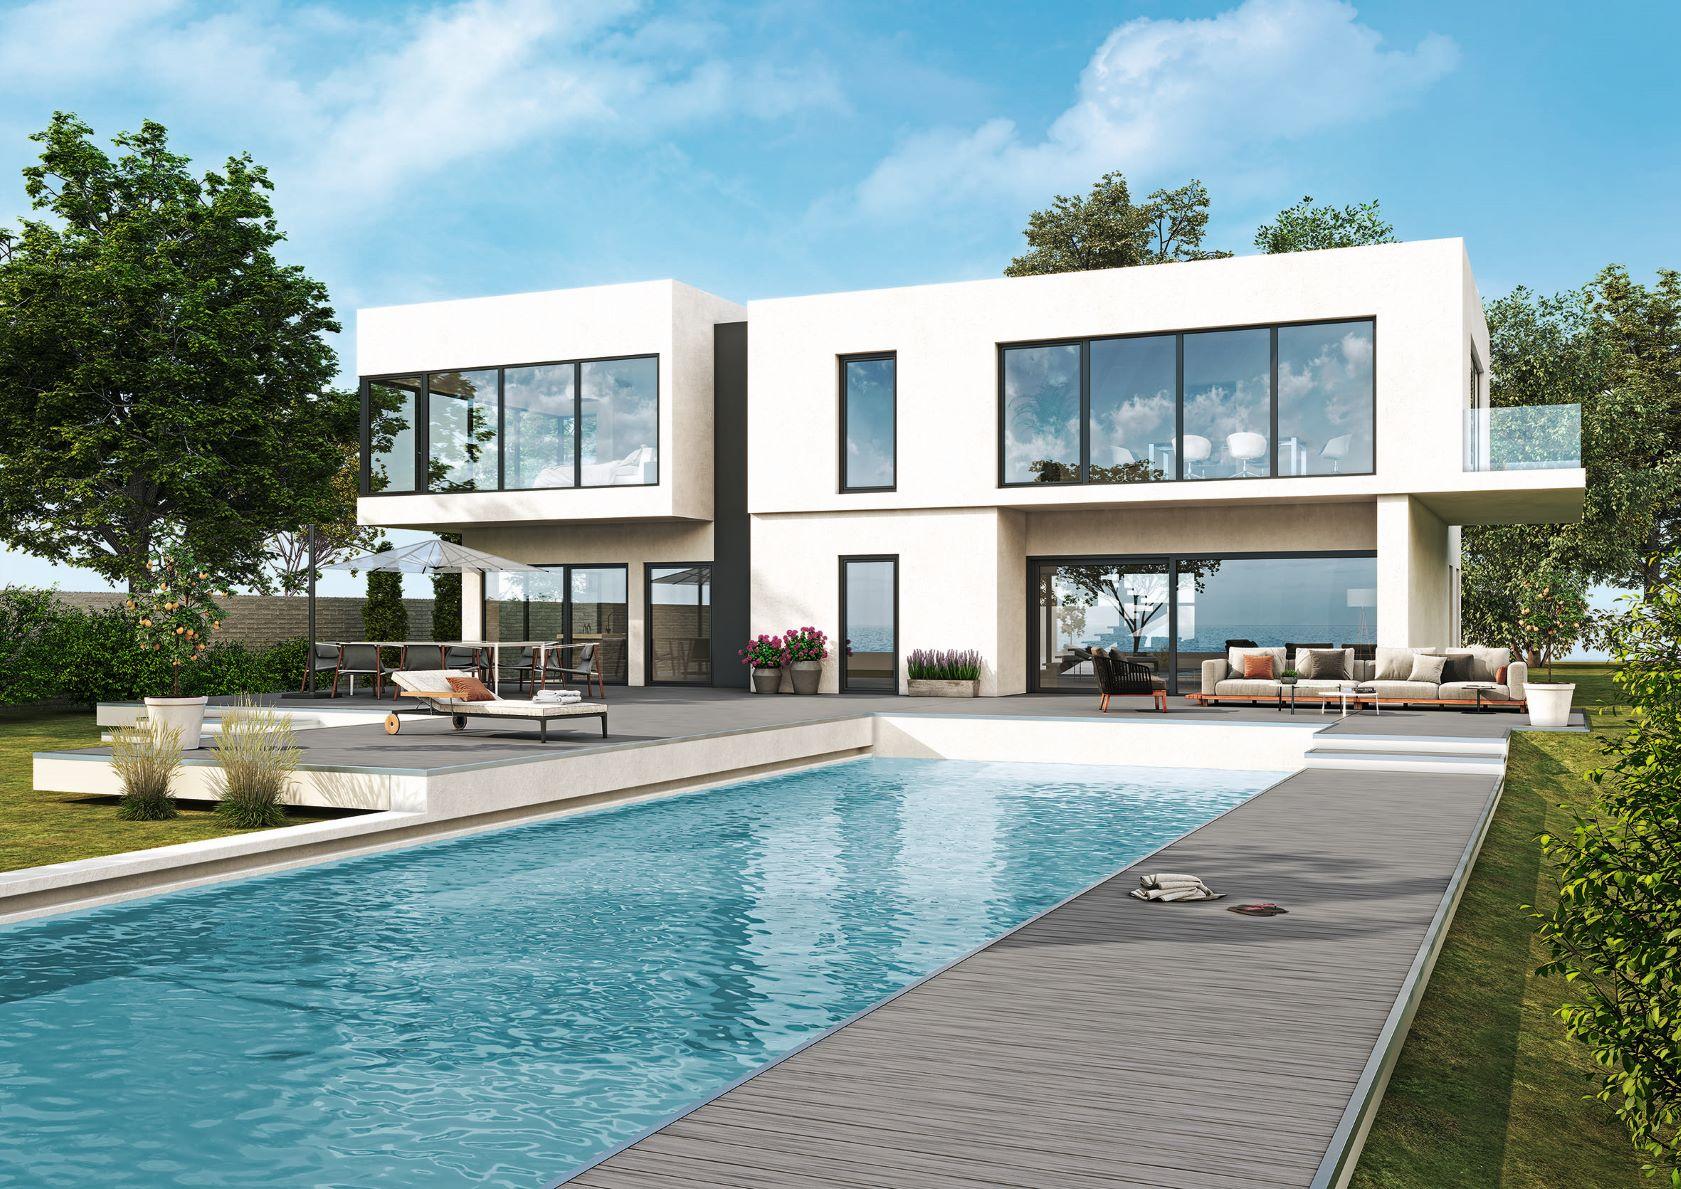 Profilový systém Elegant je alternatívou k hliníkovým oknám so zachovaním vlastností PVC